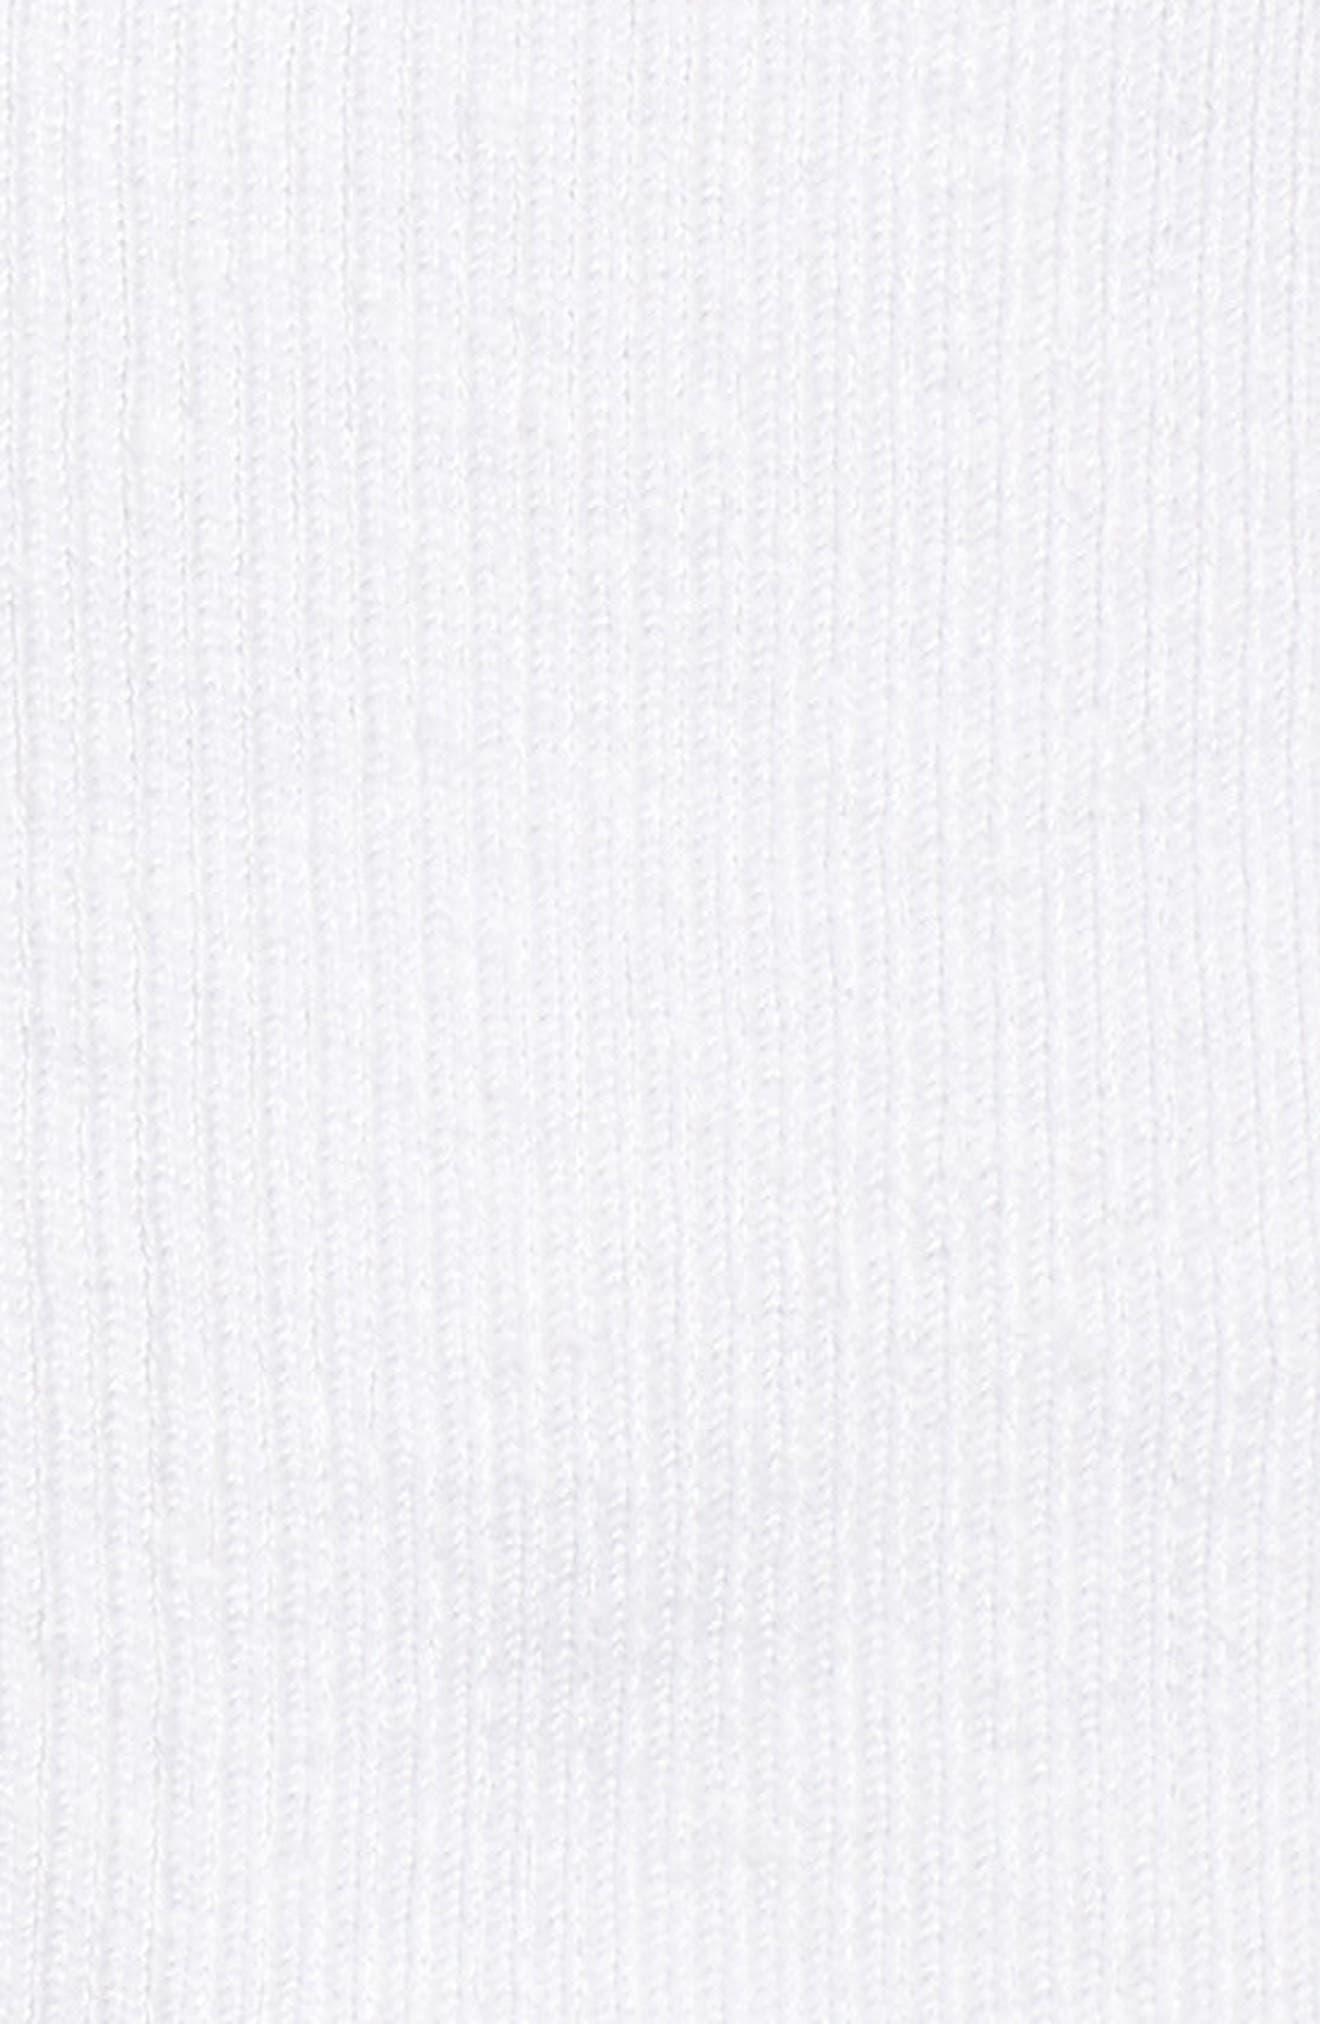 Daybreak Crop Linen Blend Cardigan,                             Alternate thumbnail 5, color,                             PAPER WHITE